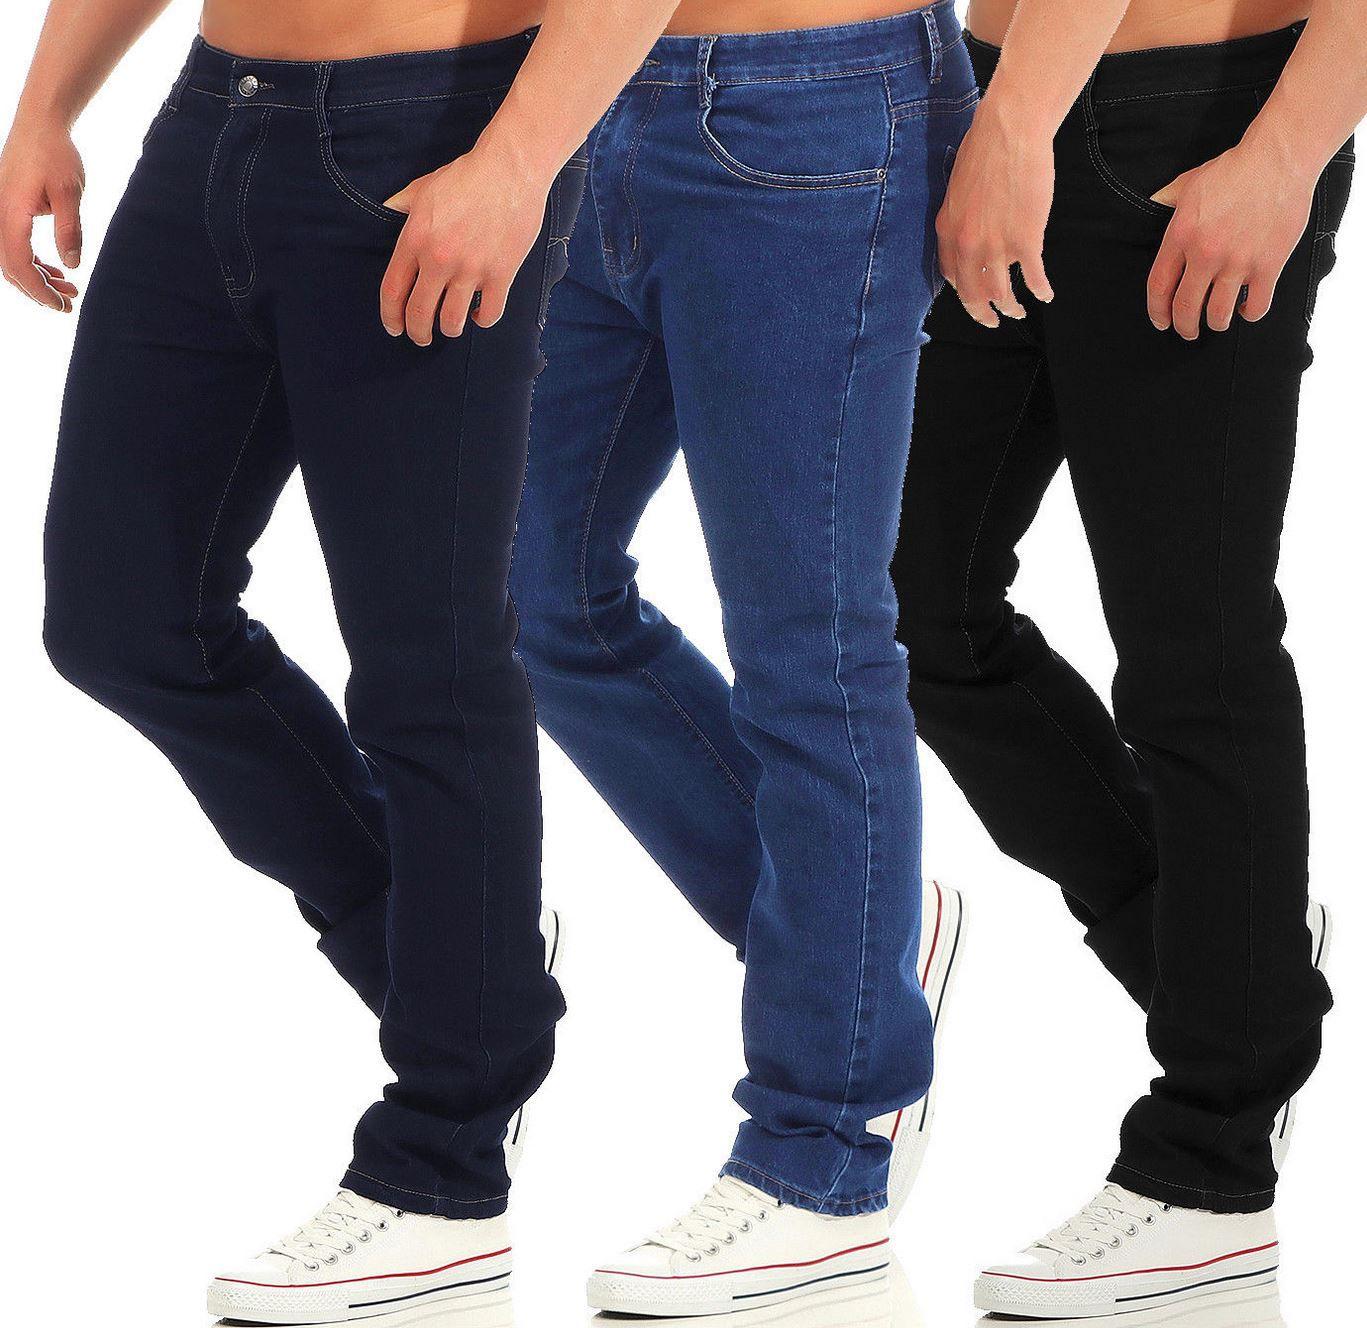 Azuonda Herren Jeans Denim Regular Straight für je 19,90€